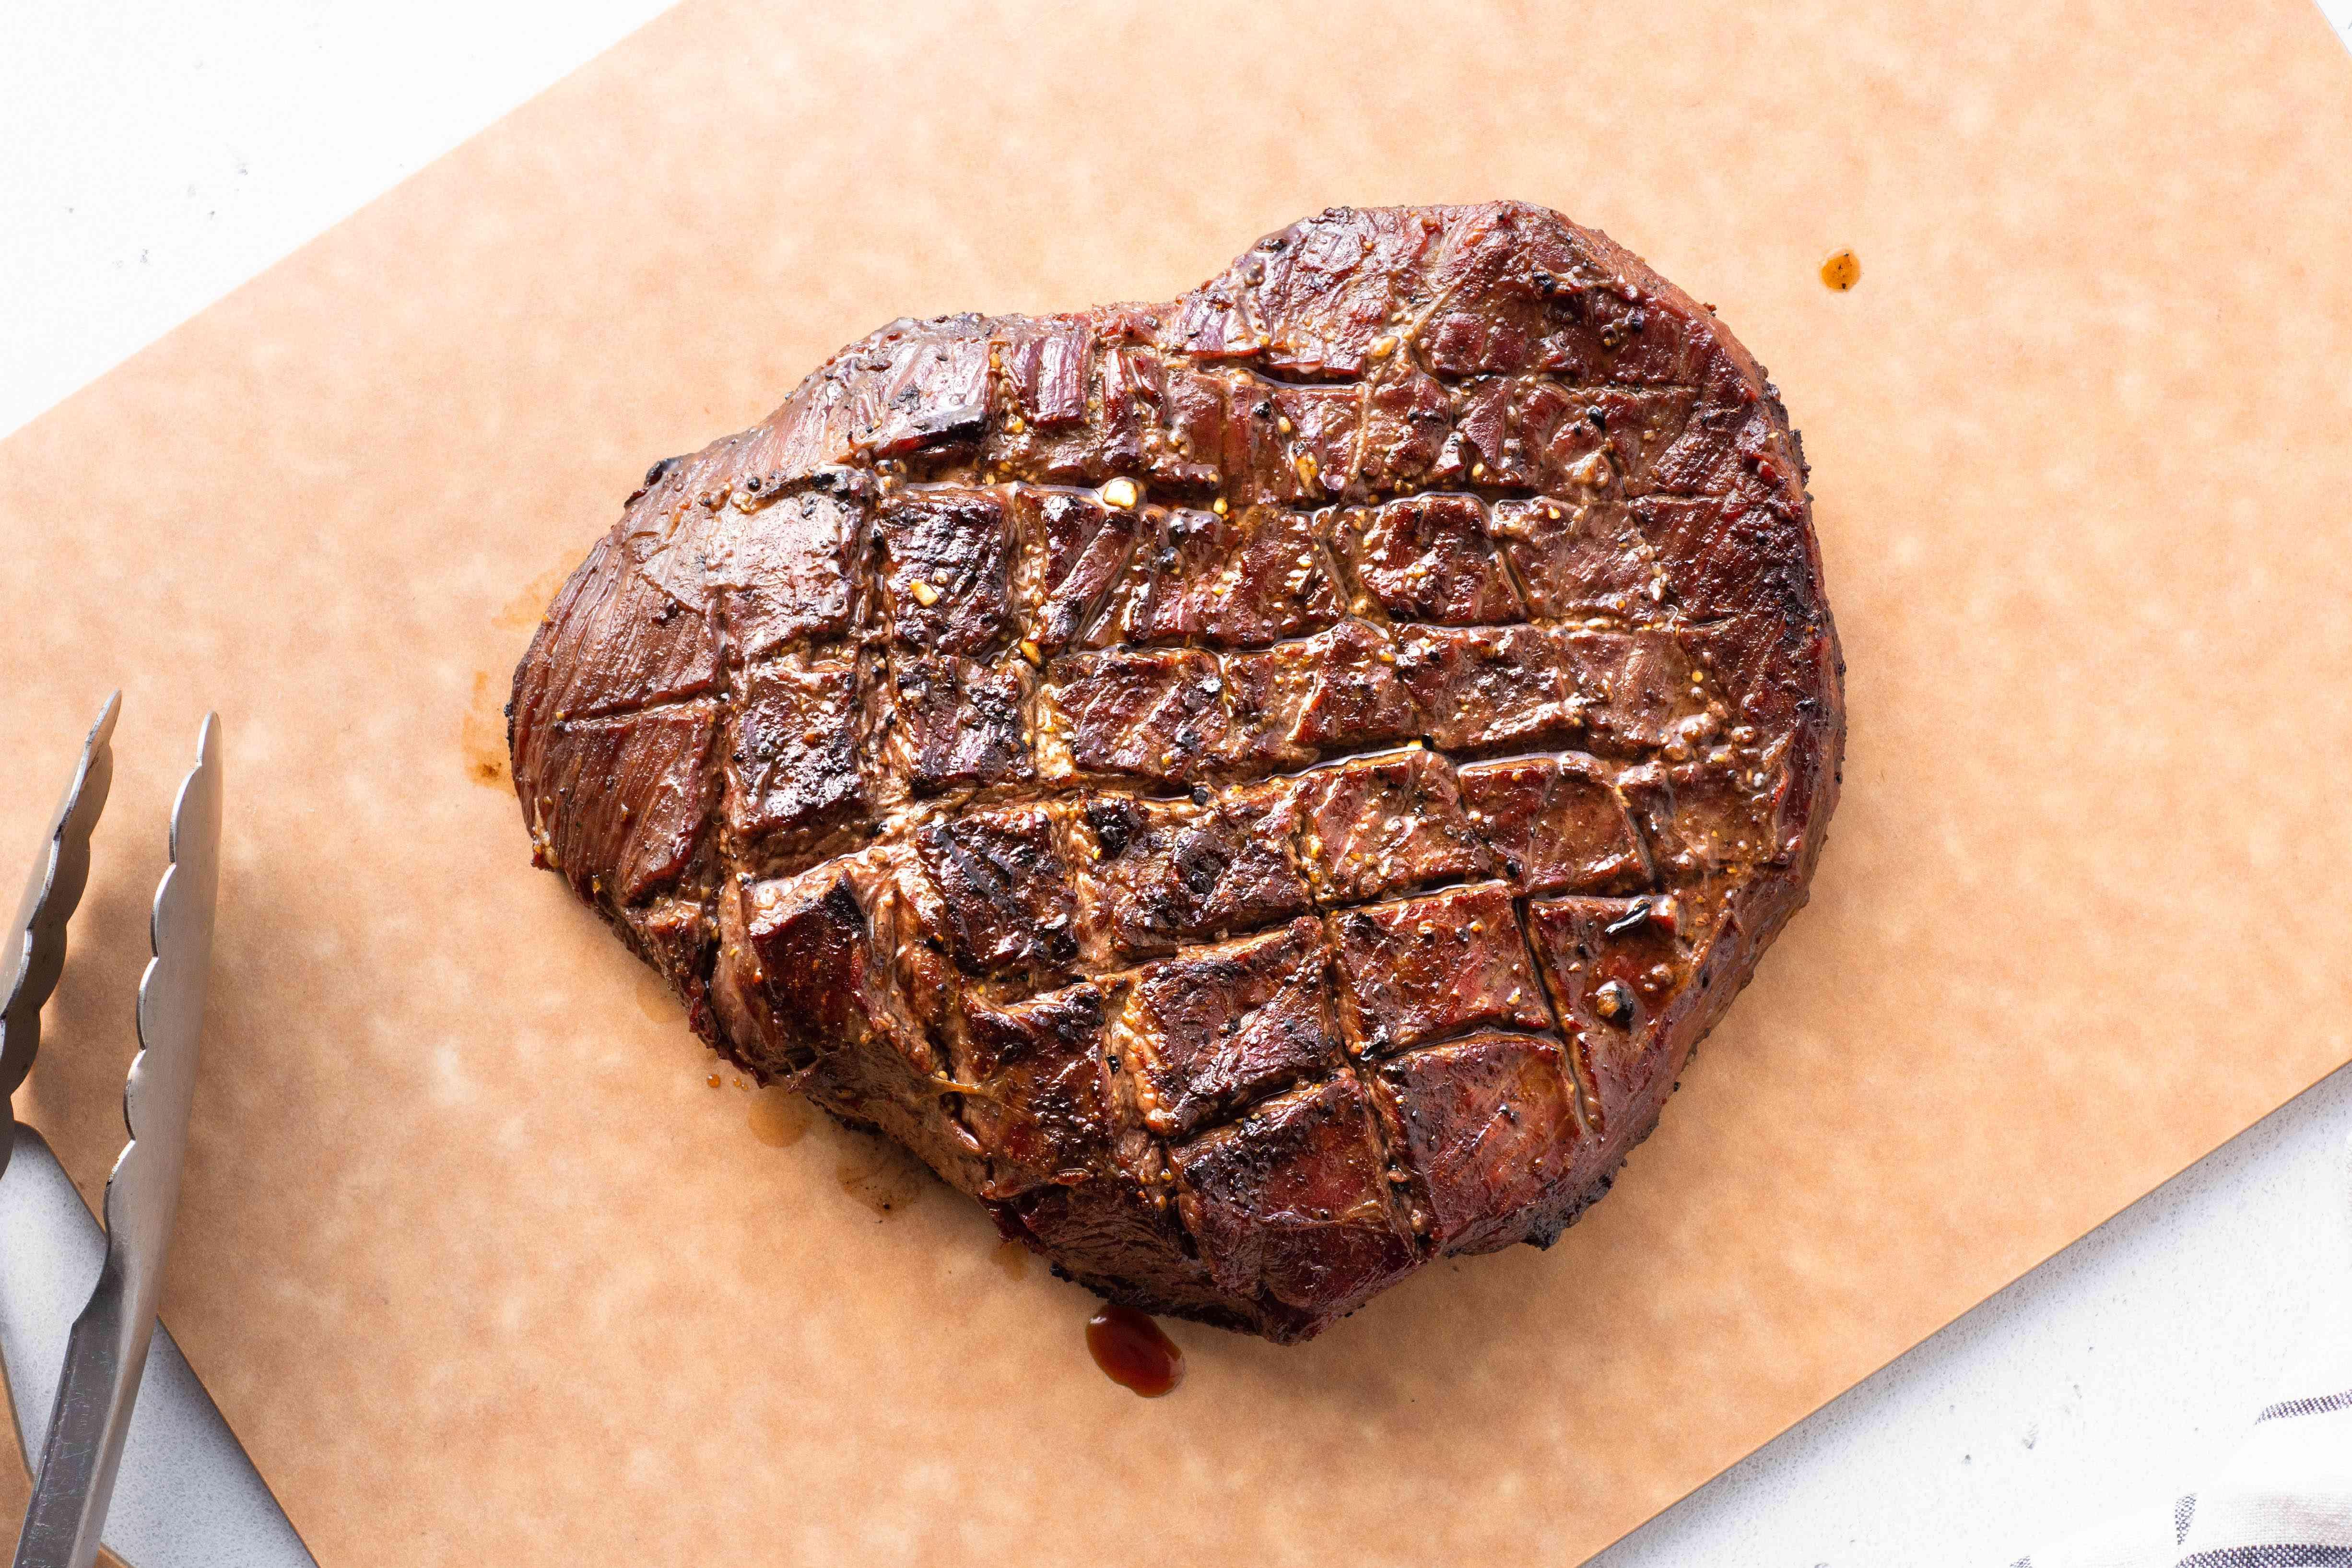 grilled flank steak resting on a cutting board